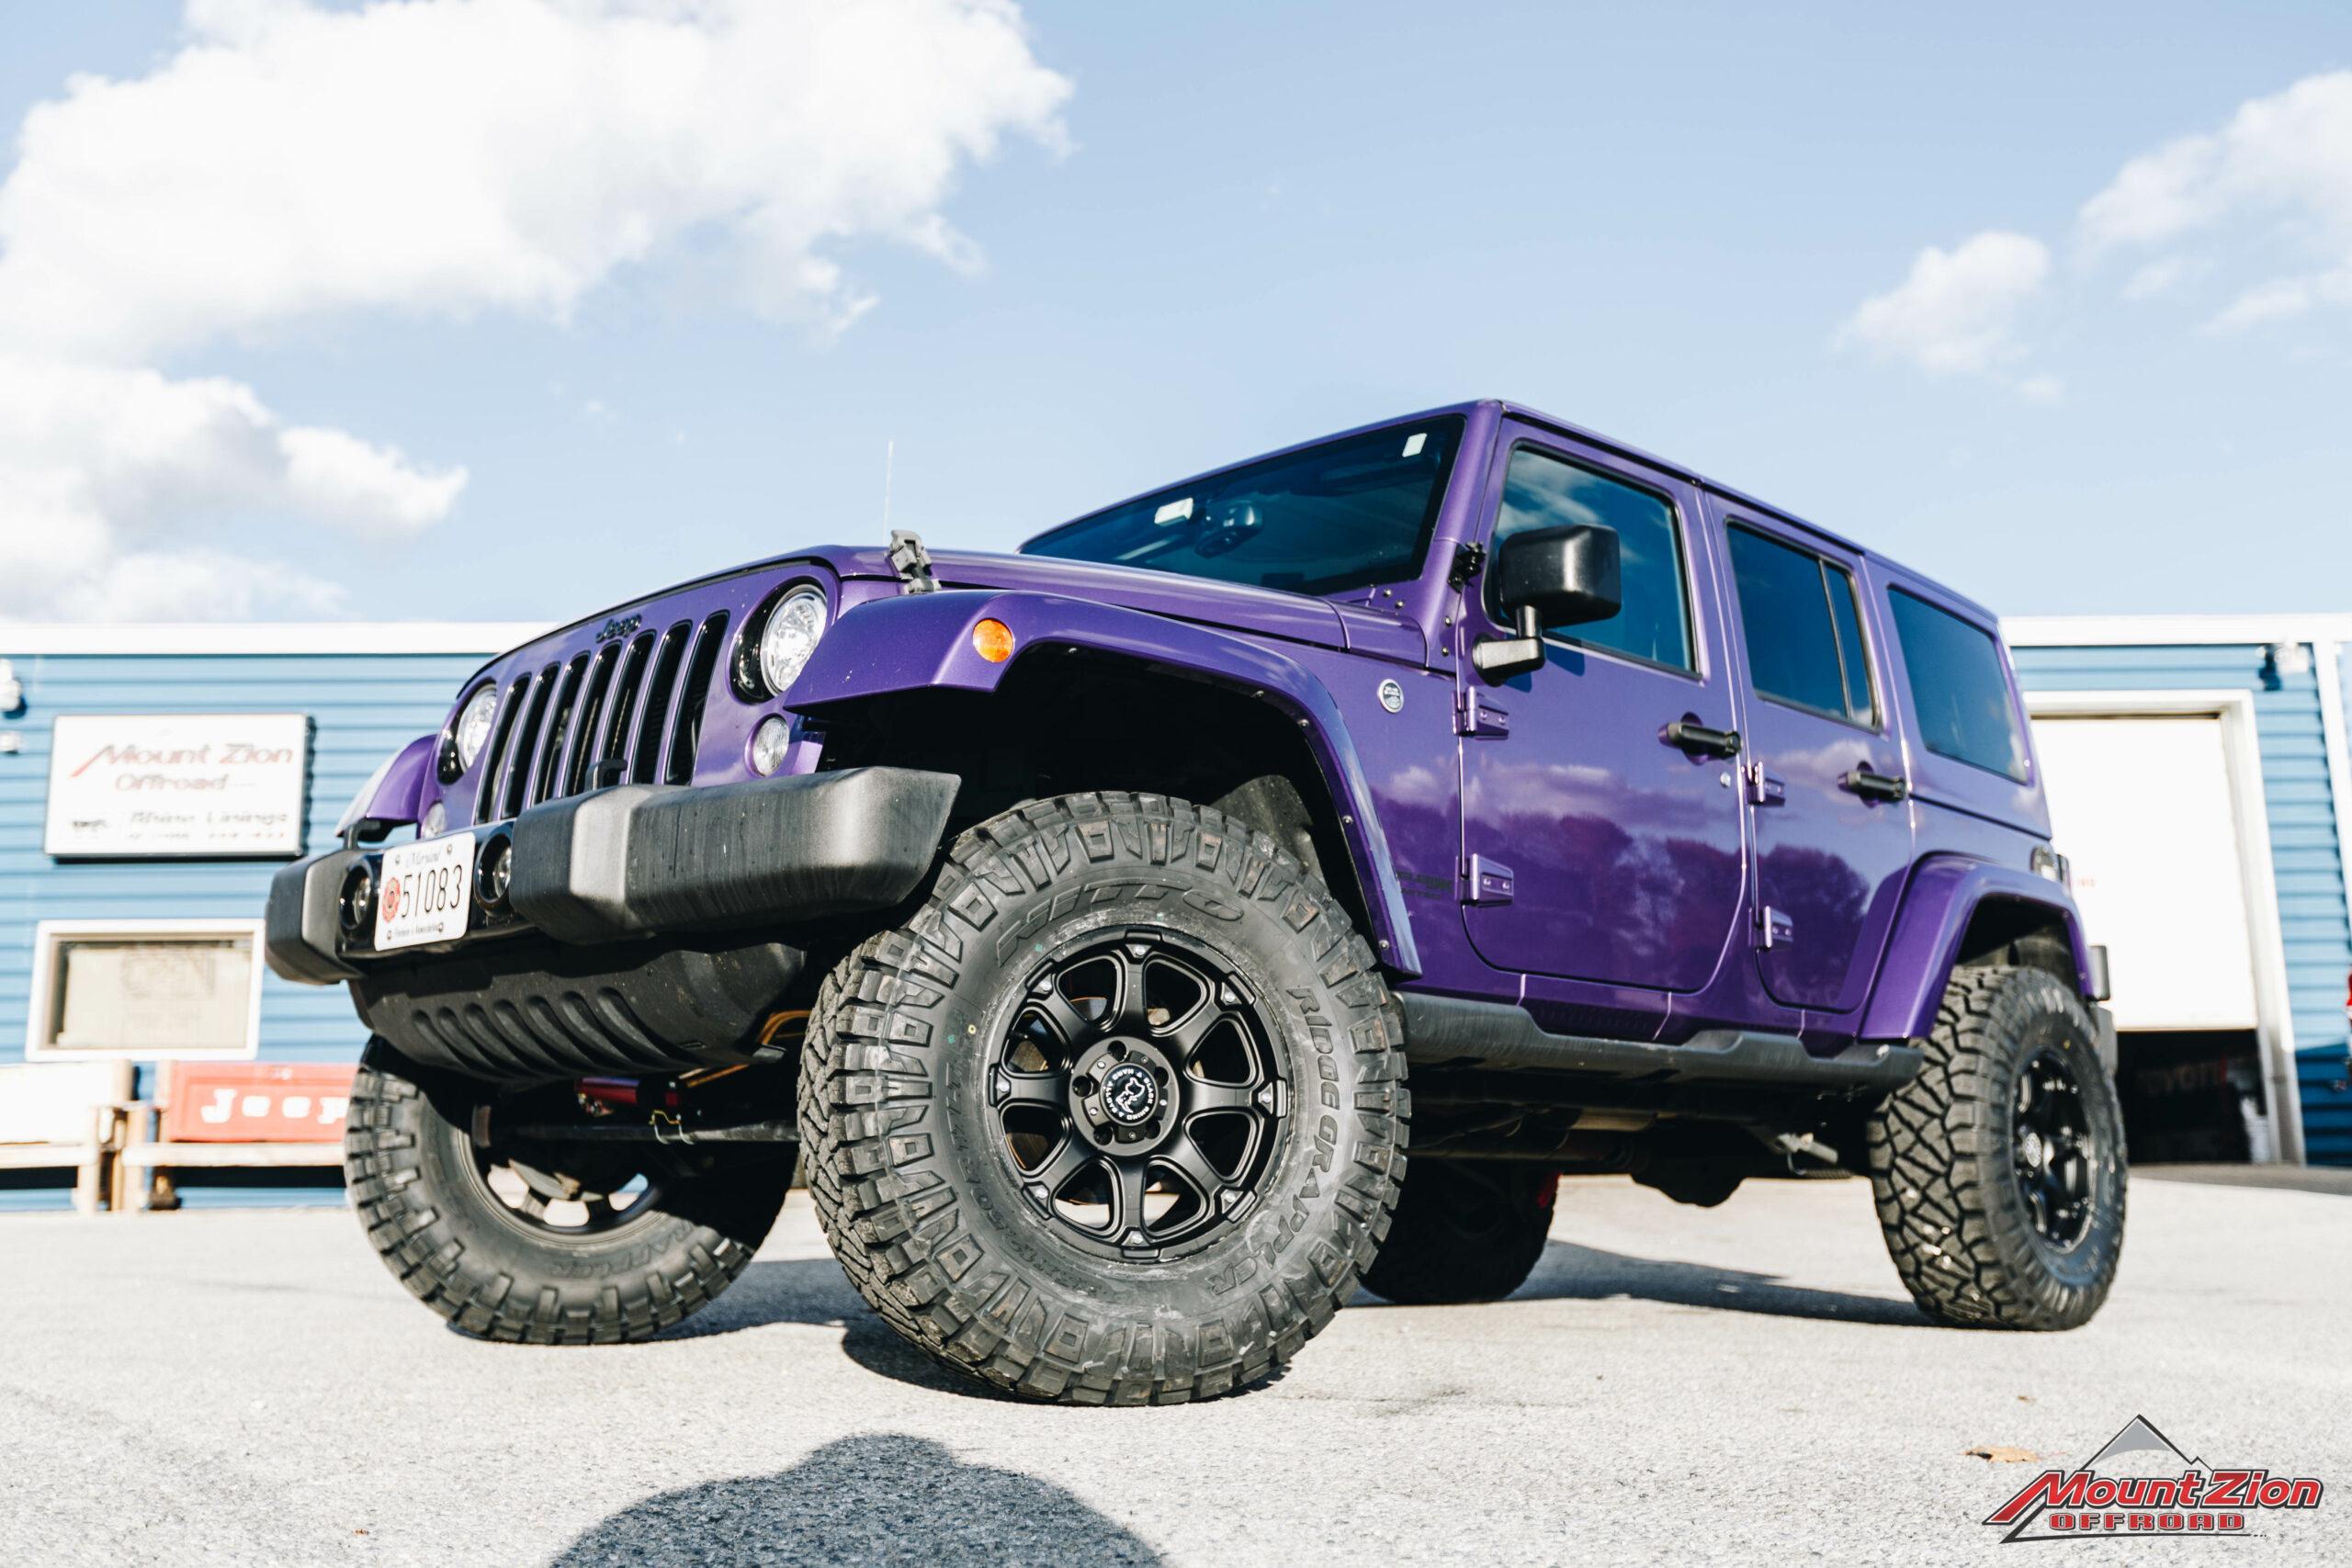 2018 Jeep Wrangler JKU Sahara